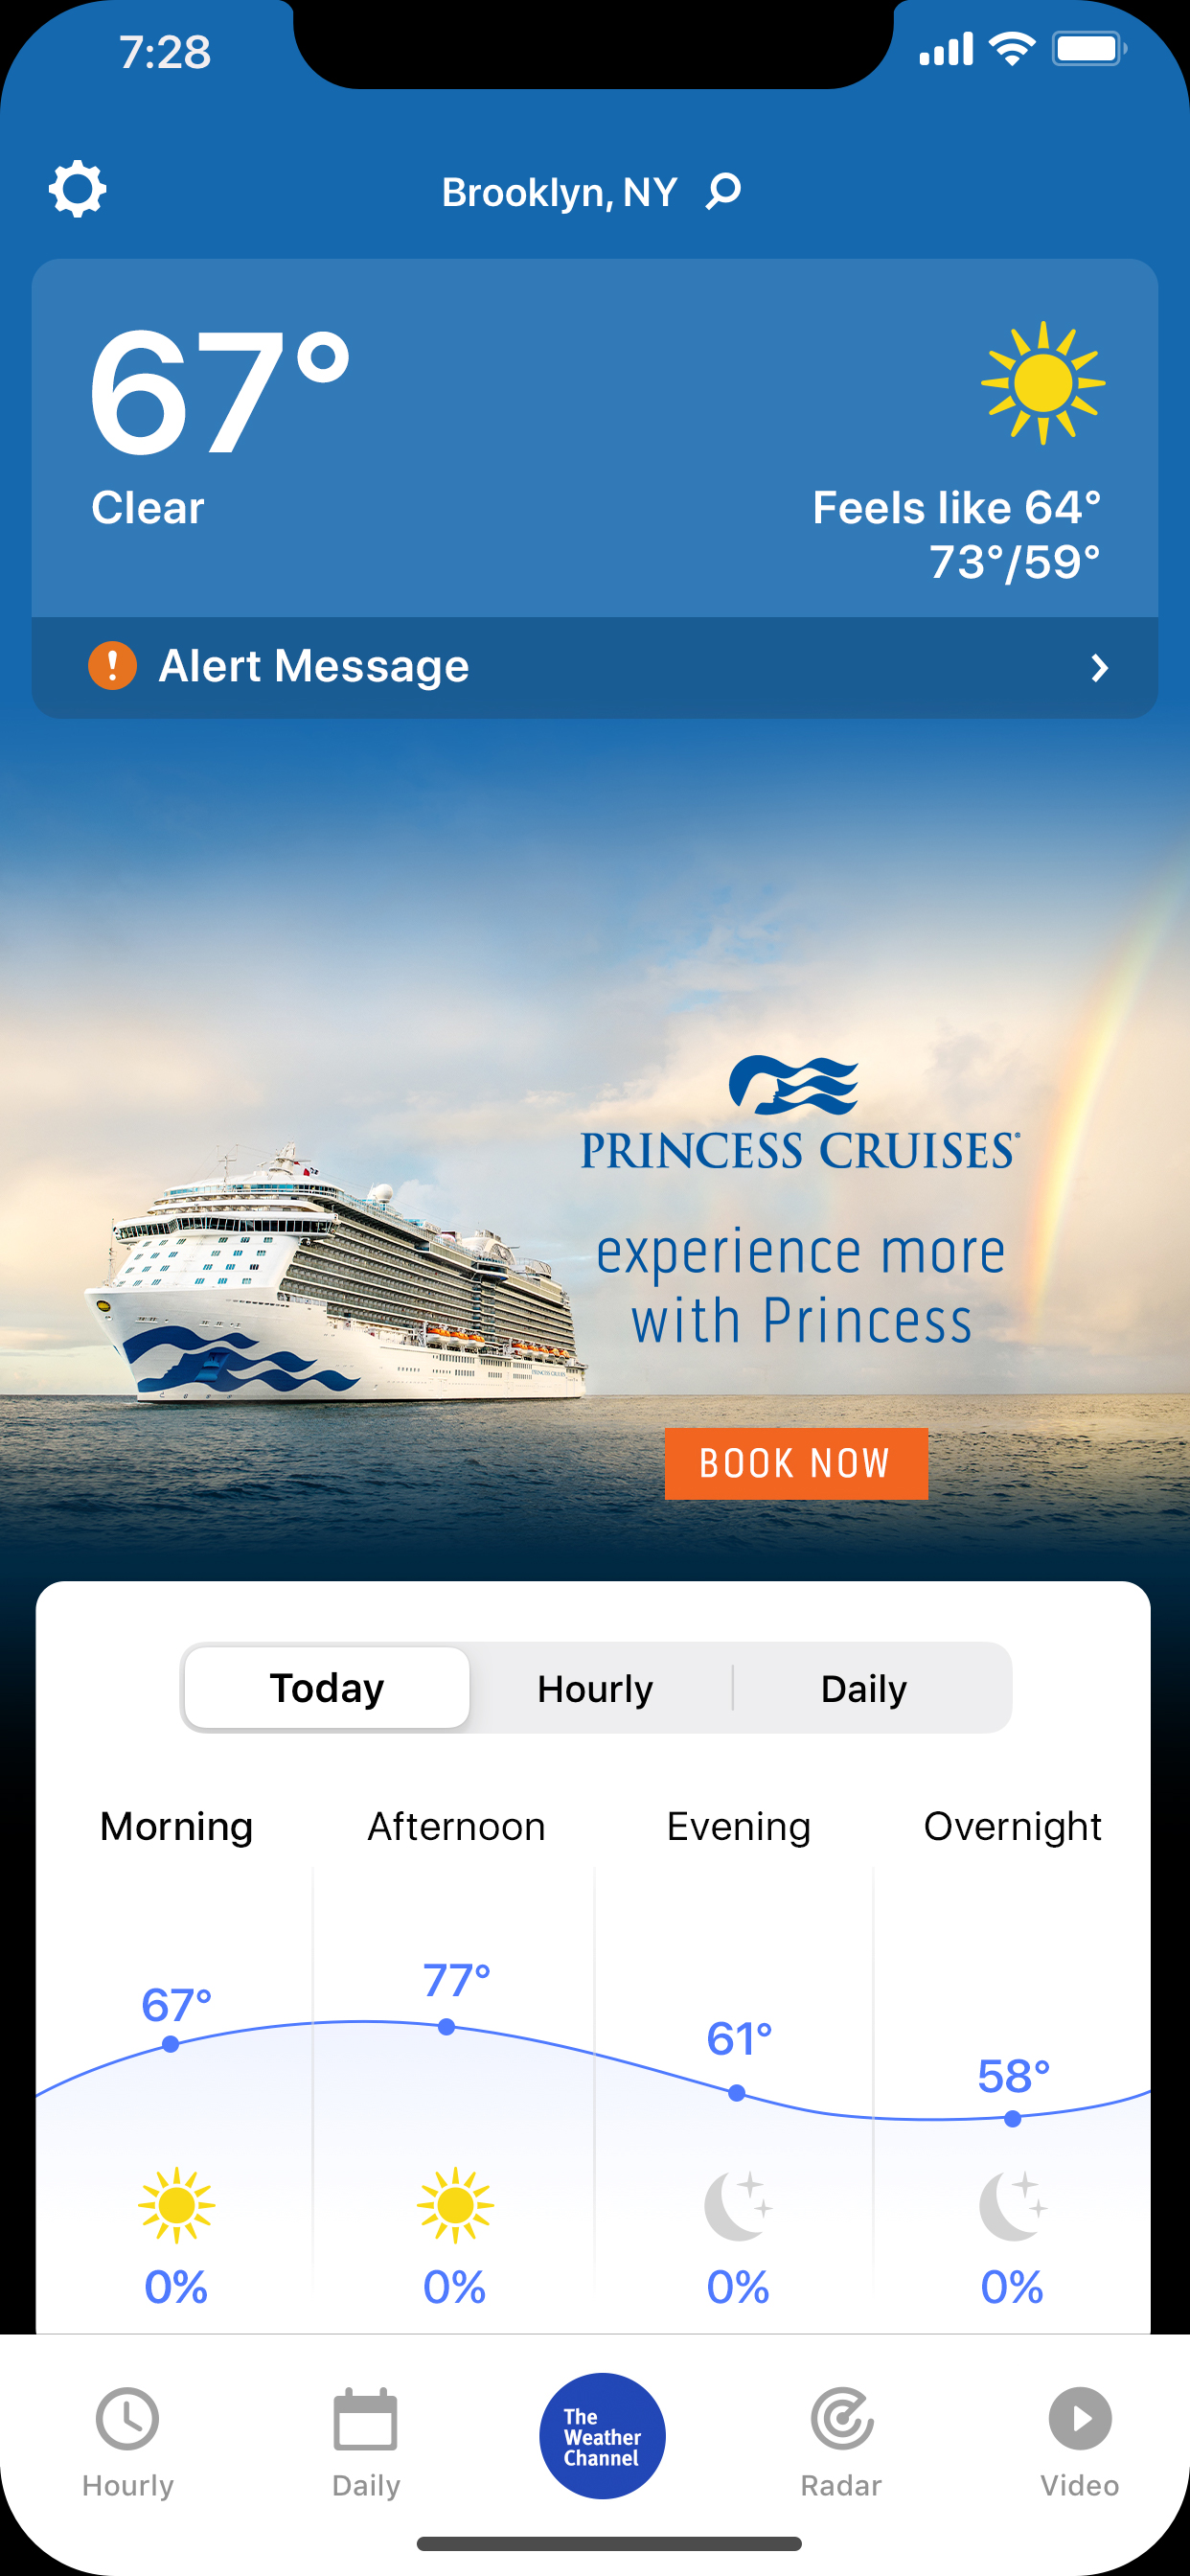 CarnivalCruise_PrincessCruise_Mobile_App-IM_NextGen-Mock_iPhoneX